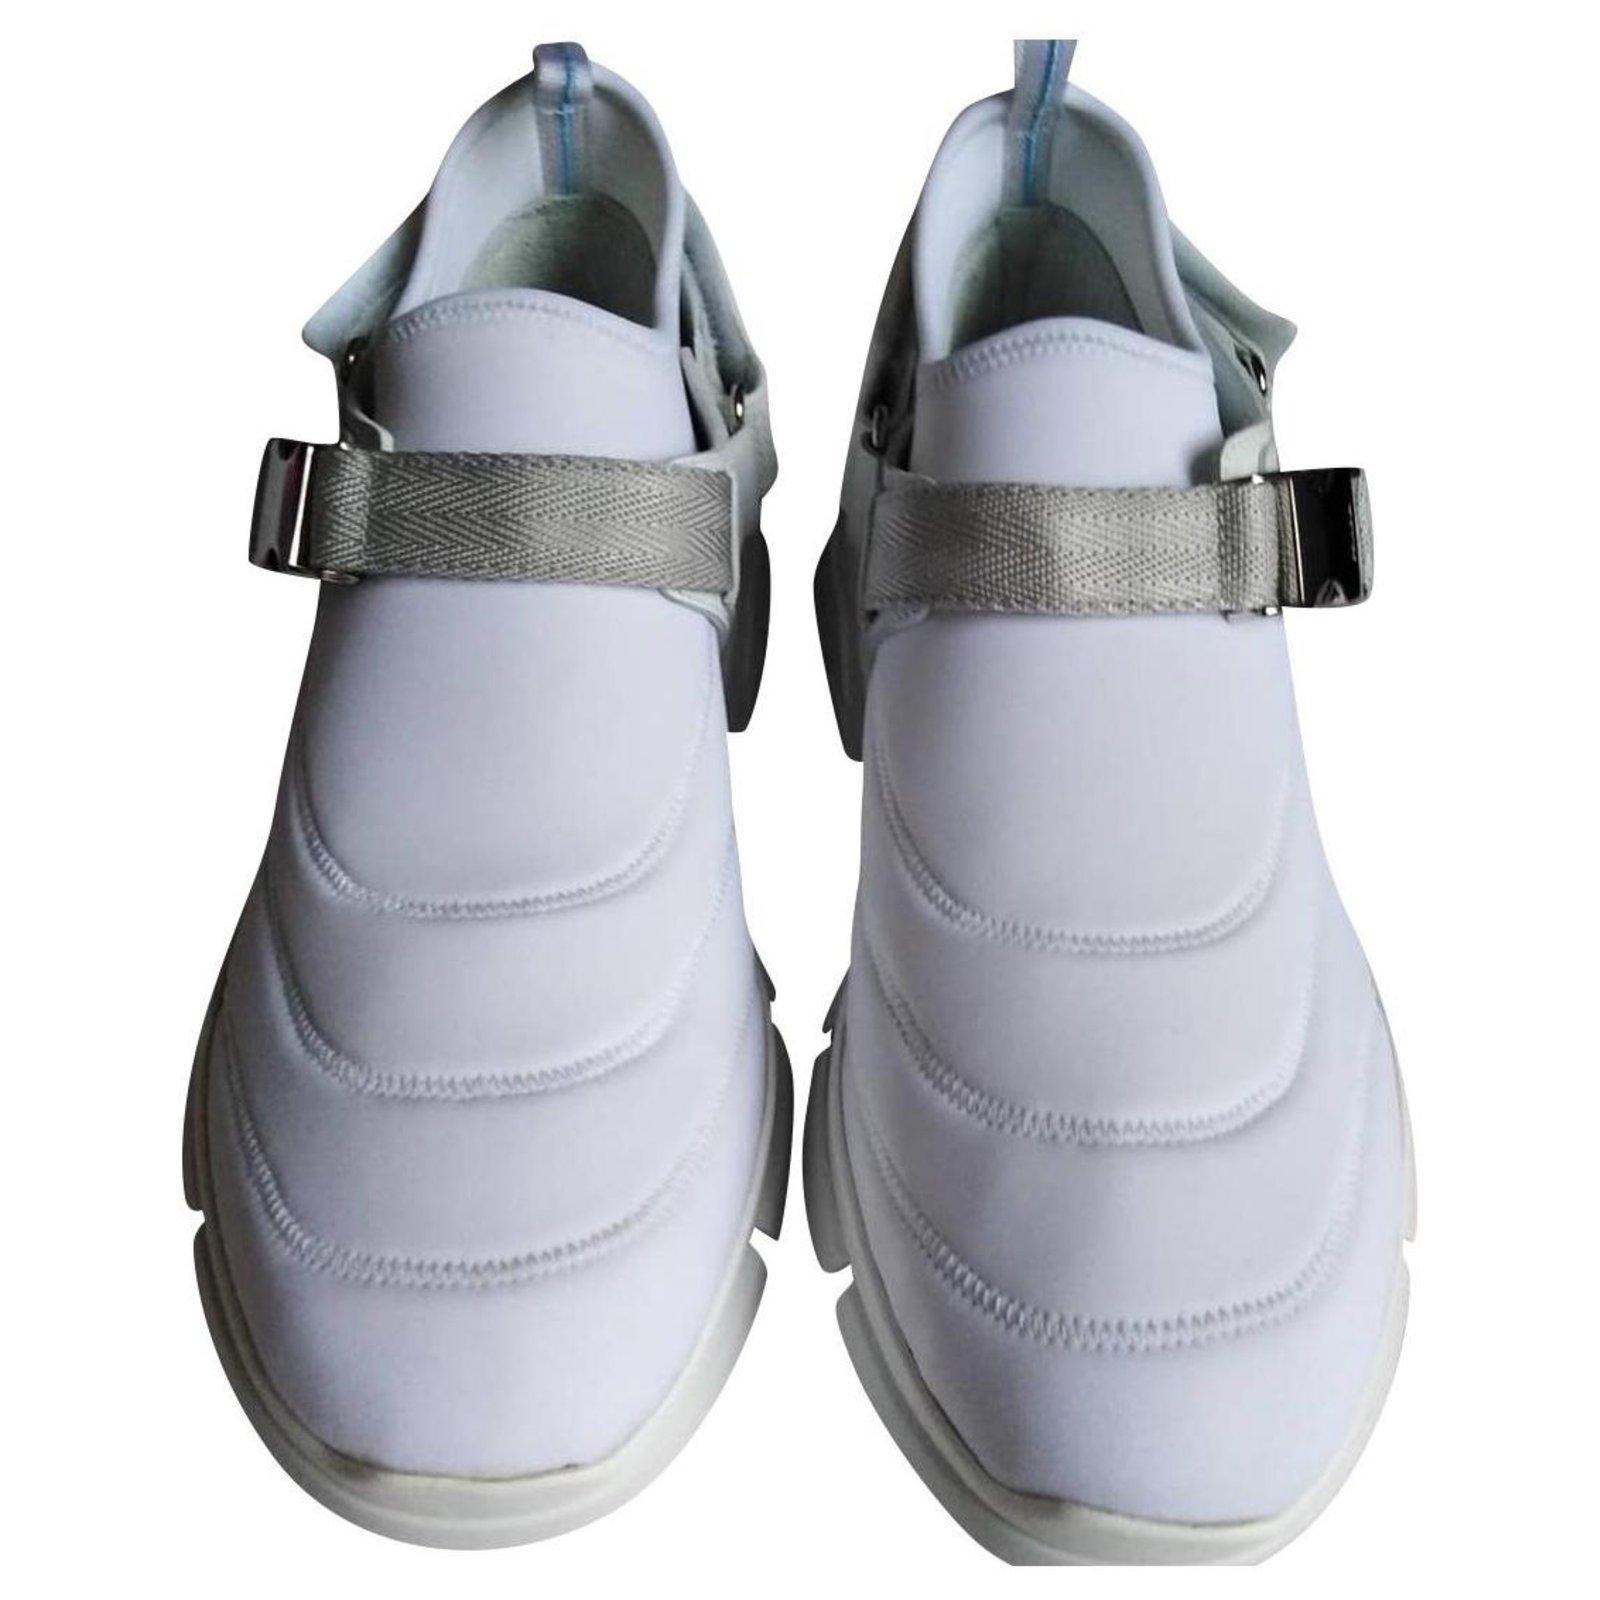 Prada Neoprene buckle Sneakers Other